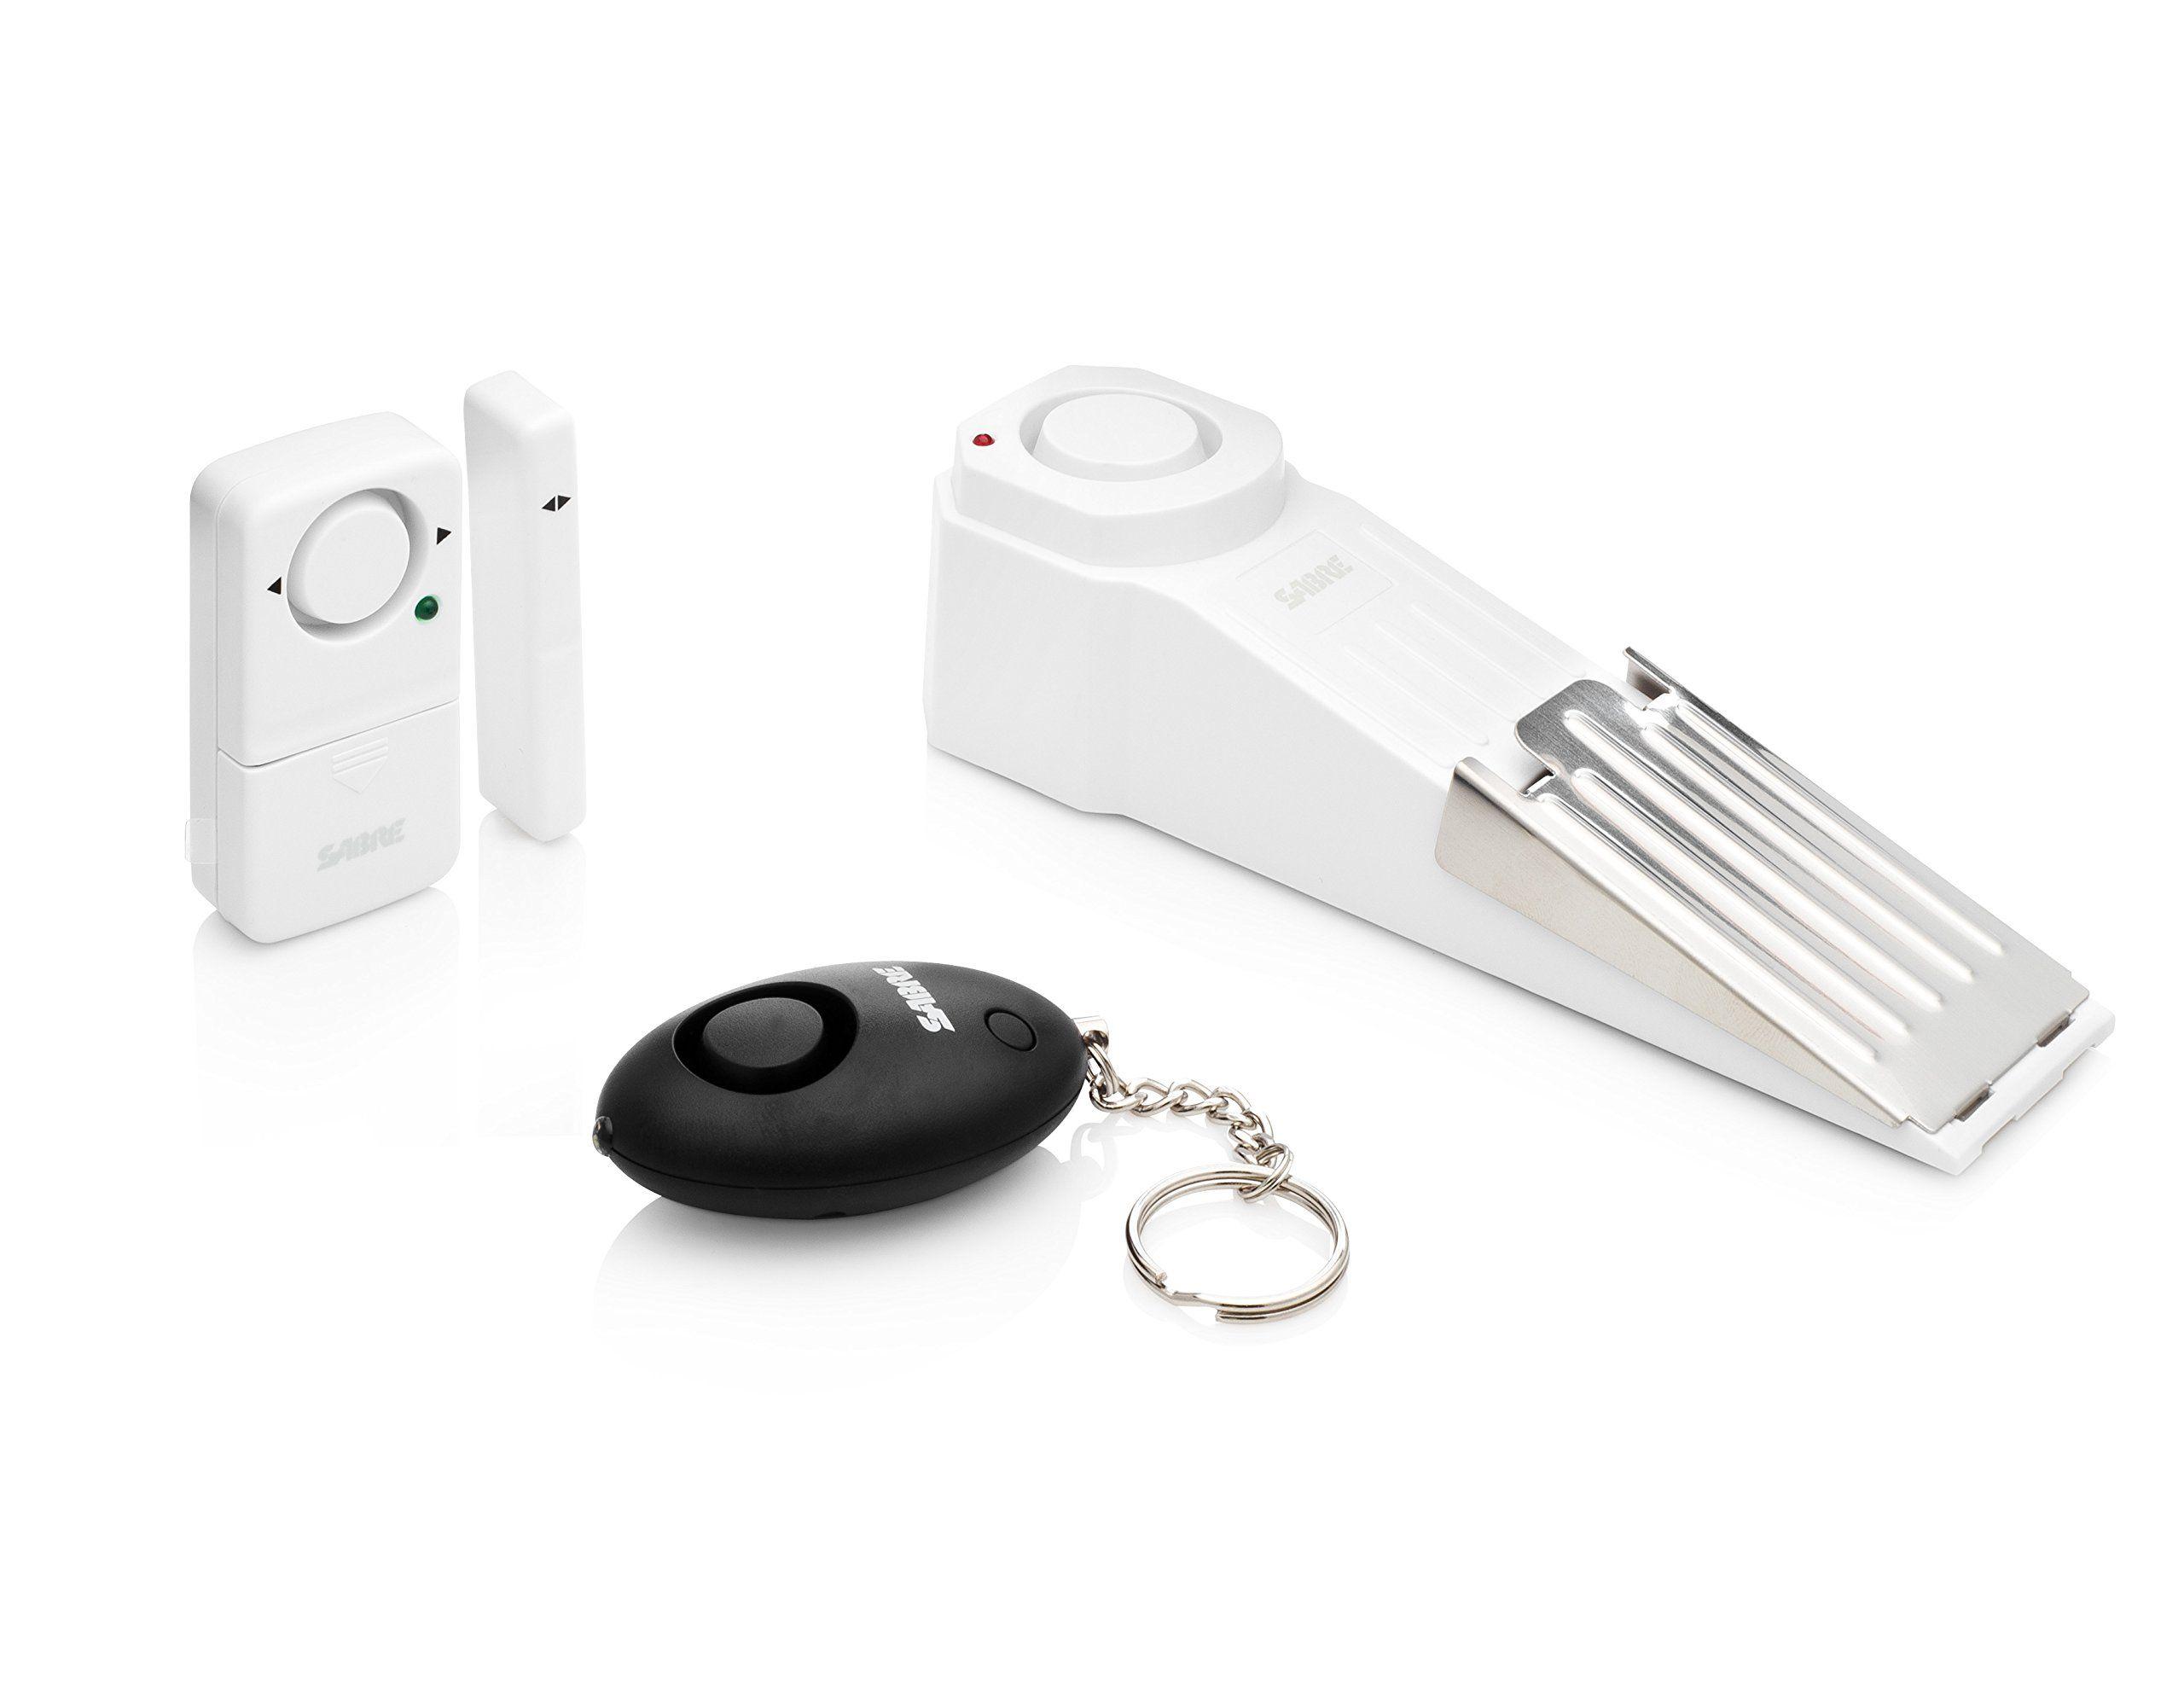 Dorm / Apartment Security Kit by SABRE - Includes Door Stop ...